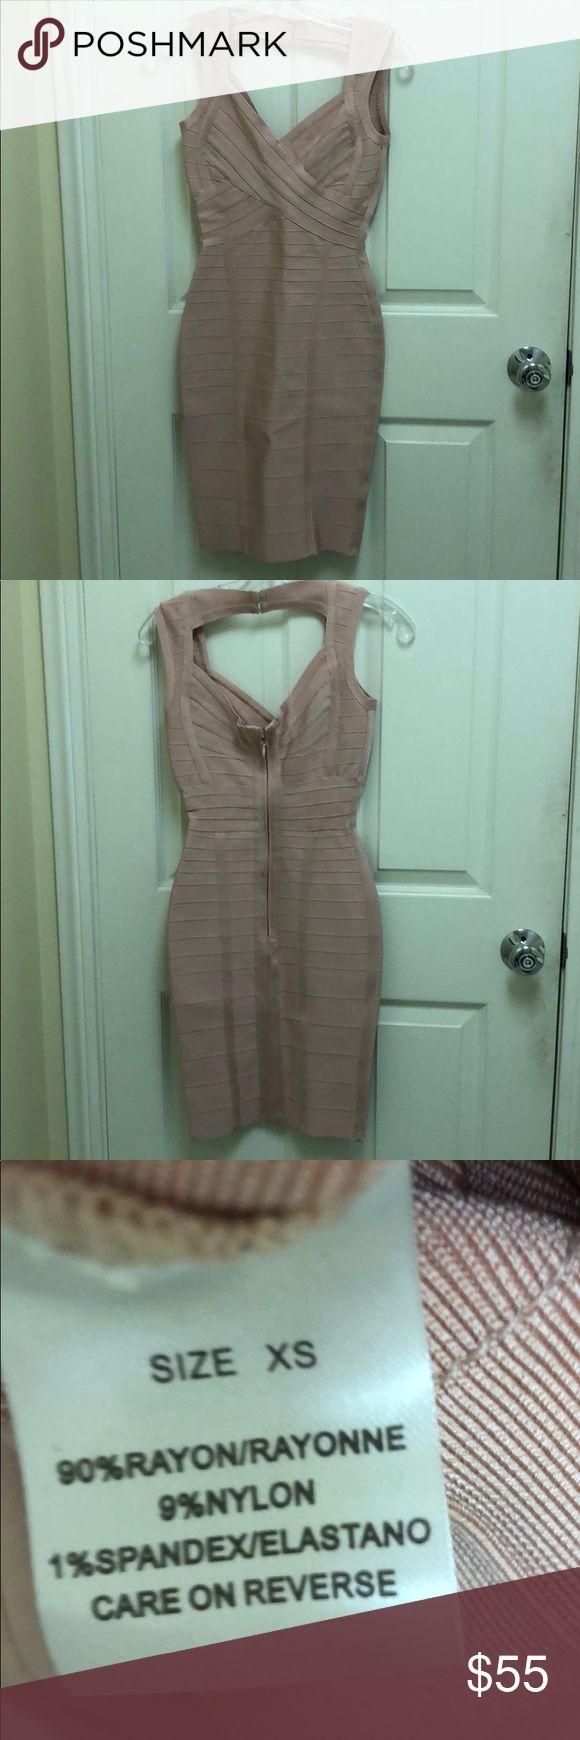 Custom made pink bandage dress. Custom made pink bandage dress. Brand new, never worn, missing the tag. Dresses